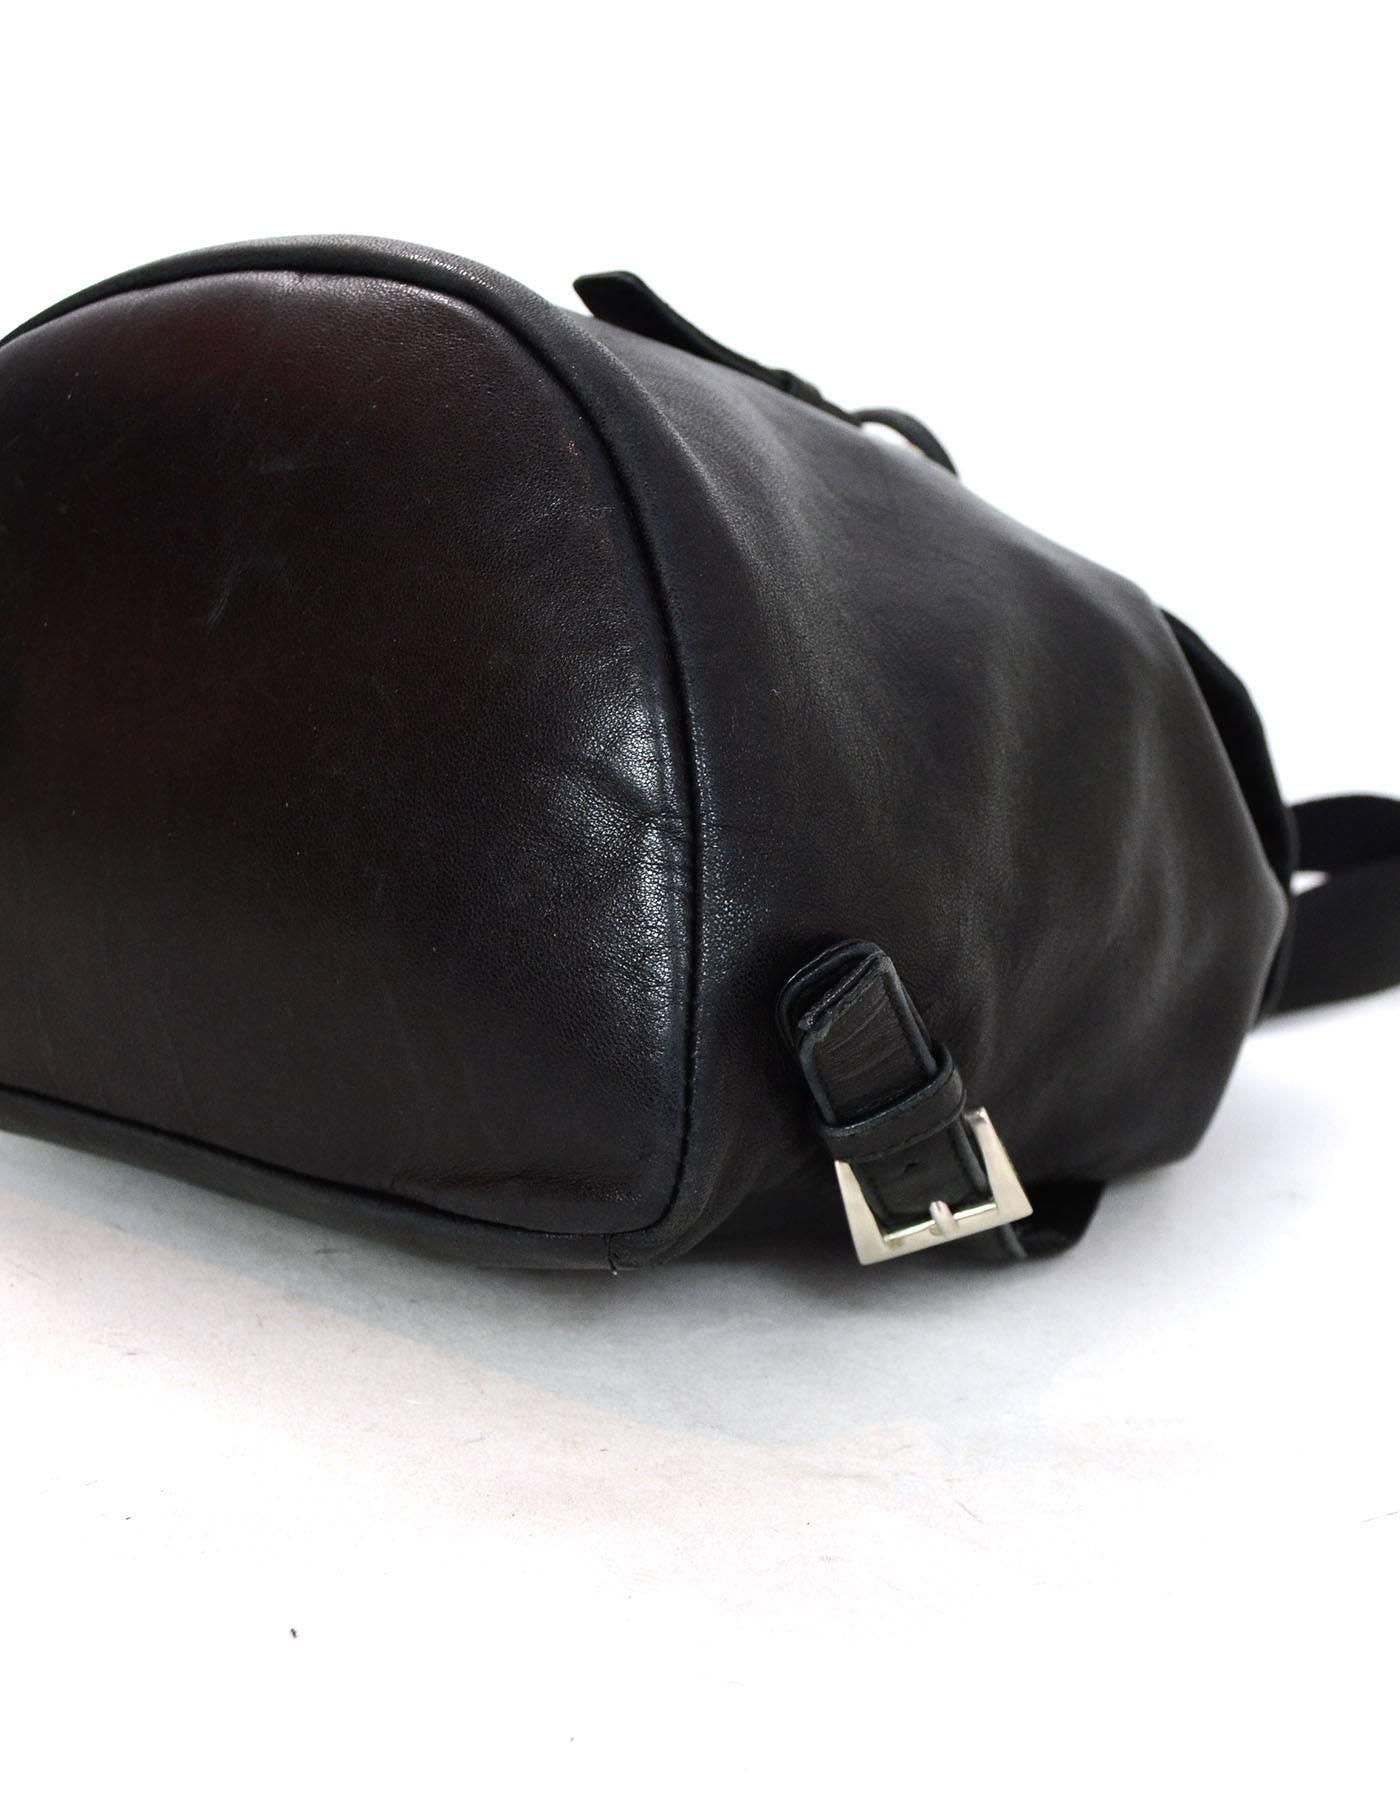 048e92b3755a09 coupon prada black leather backpack 874d2 6d39d